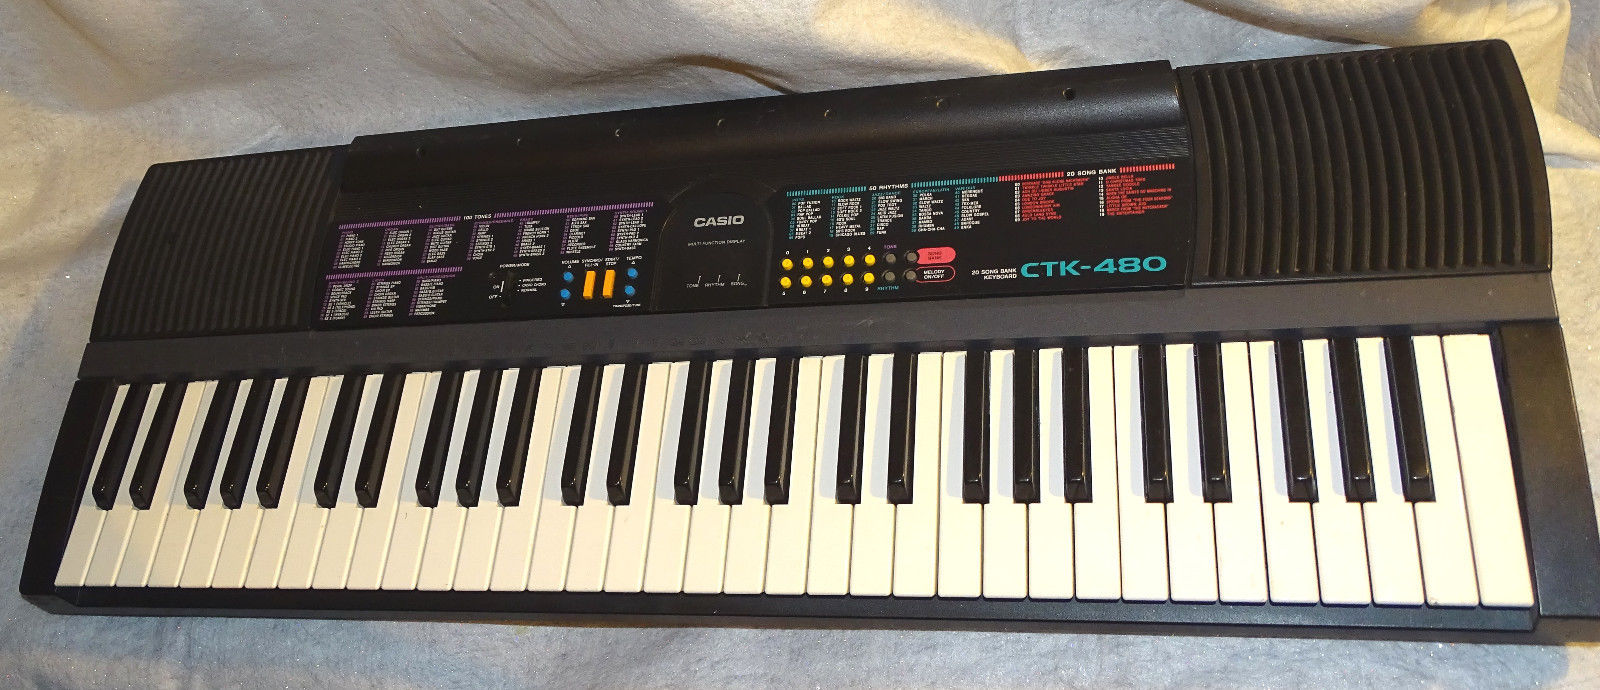 CASIO CTK-480 Musical Keyboard